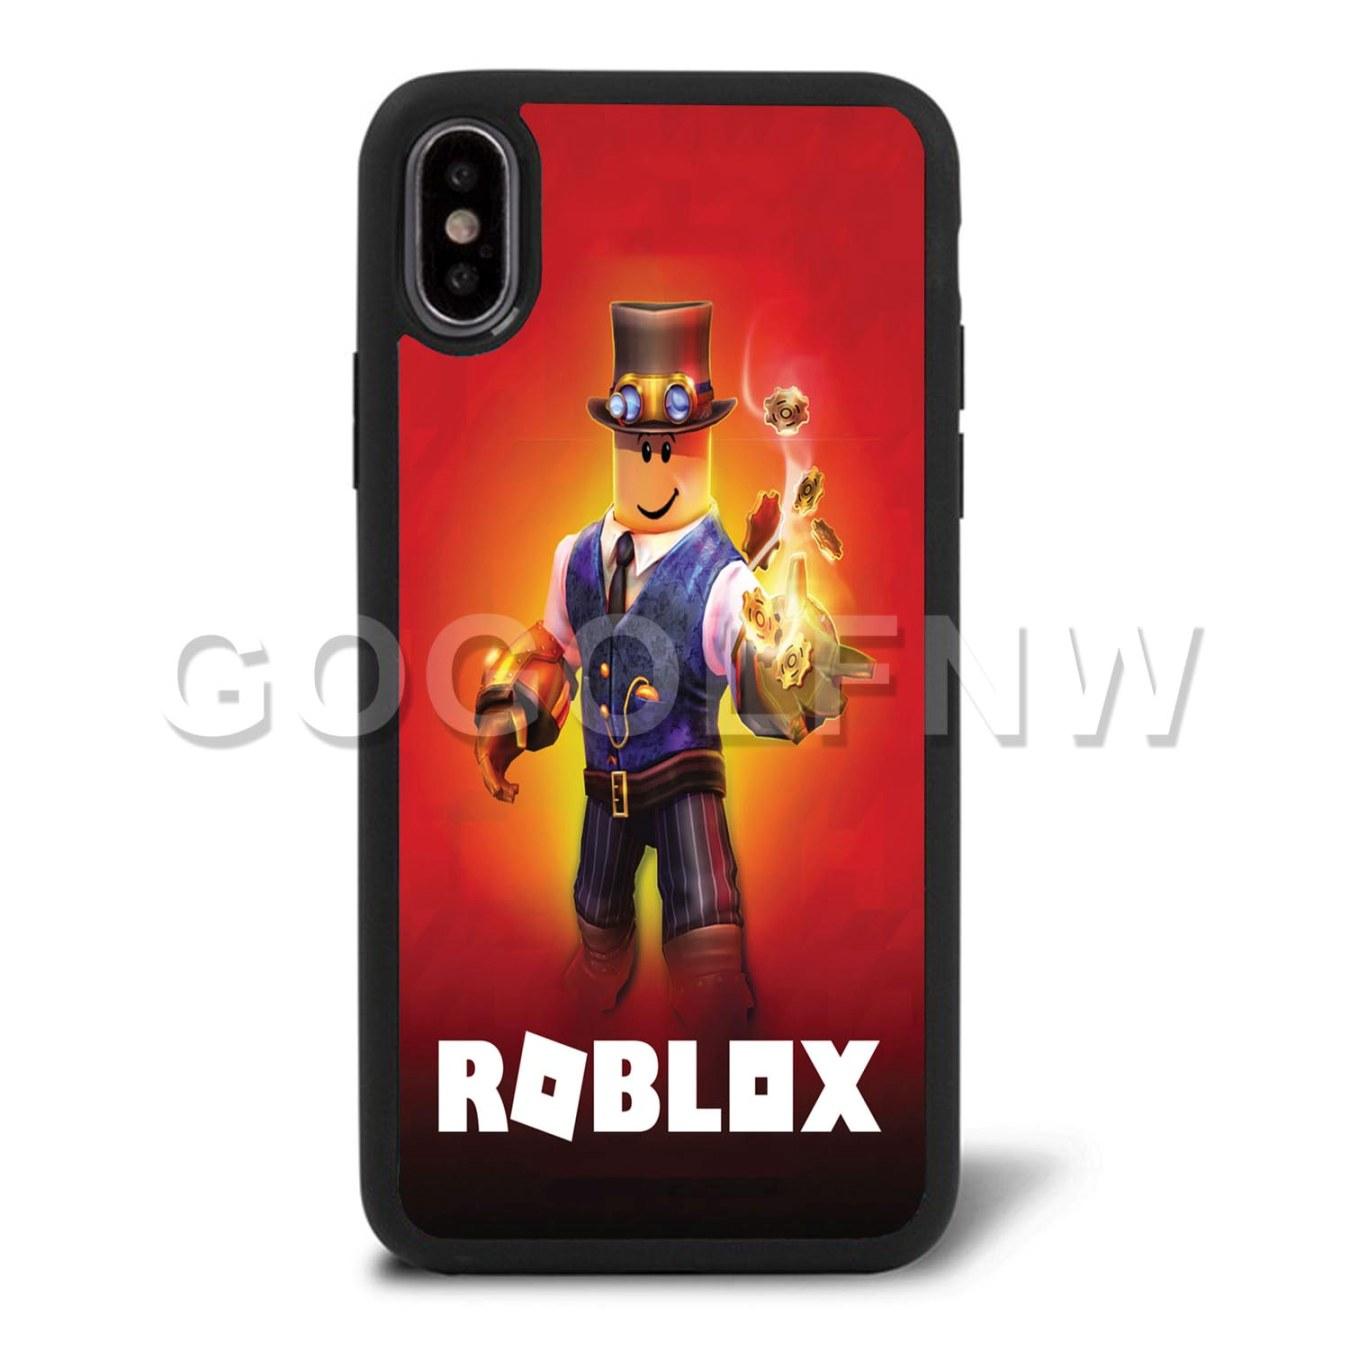 Roblox Phone Case Iphone Samsung Galaxy Htc Lg Case Cover